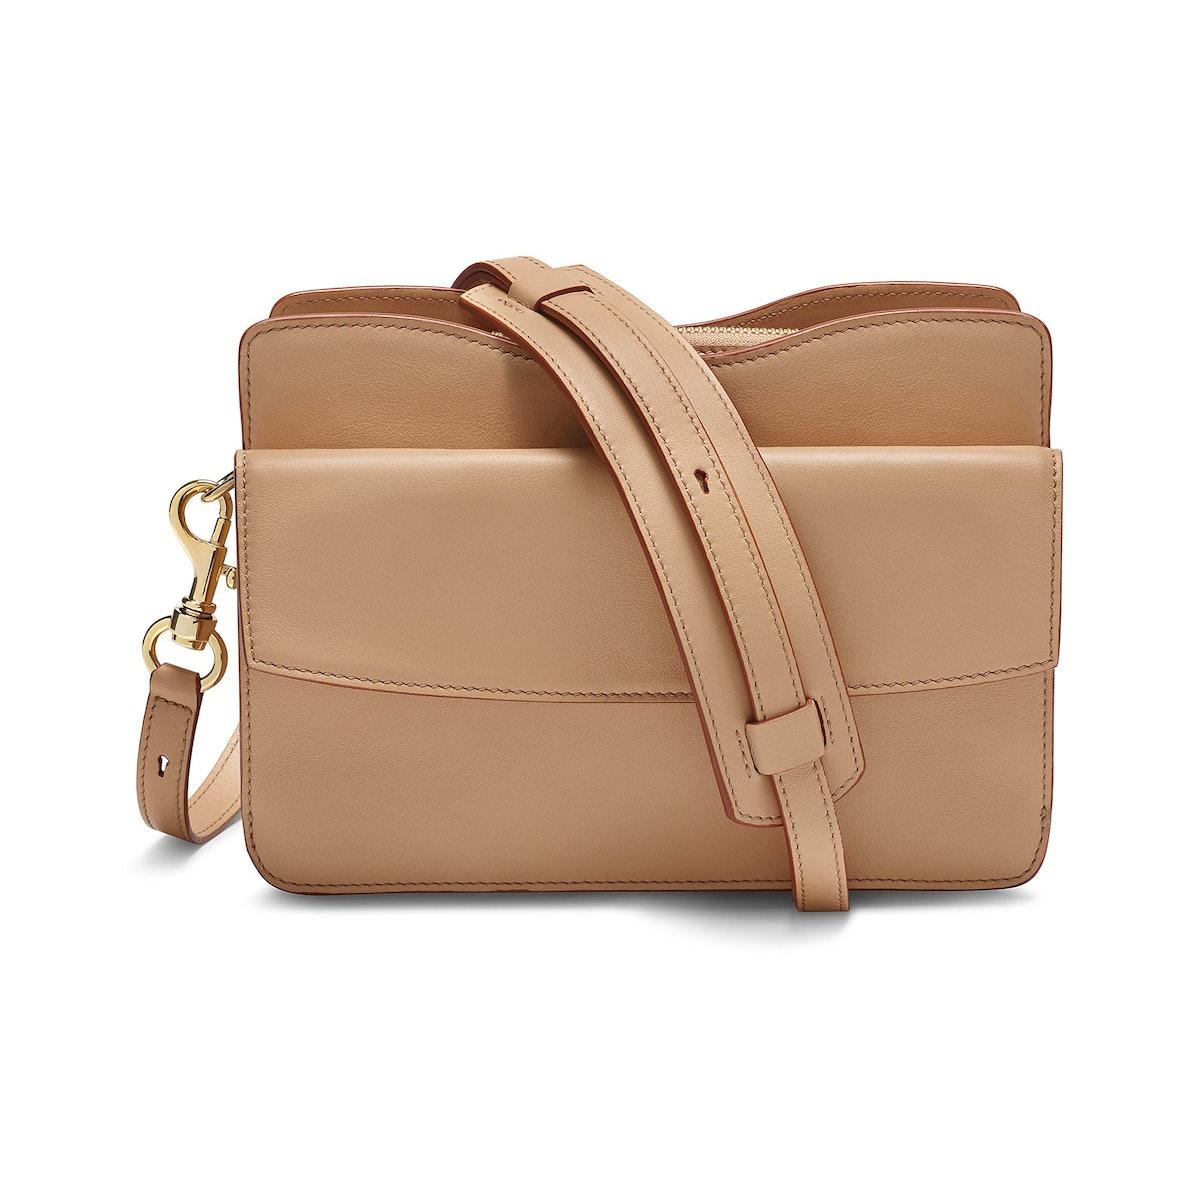 Accordion Satchel Bag